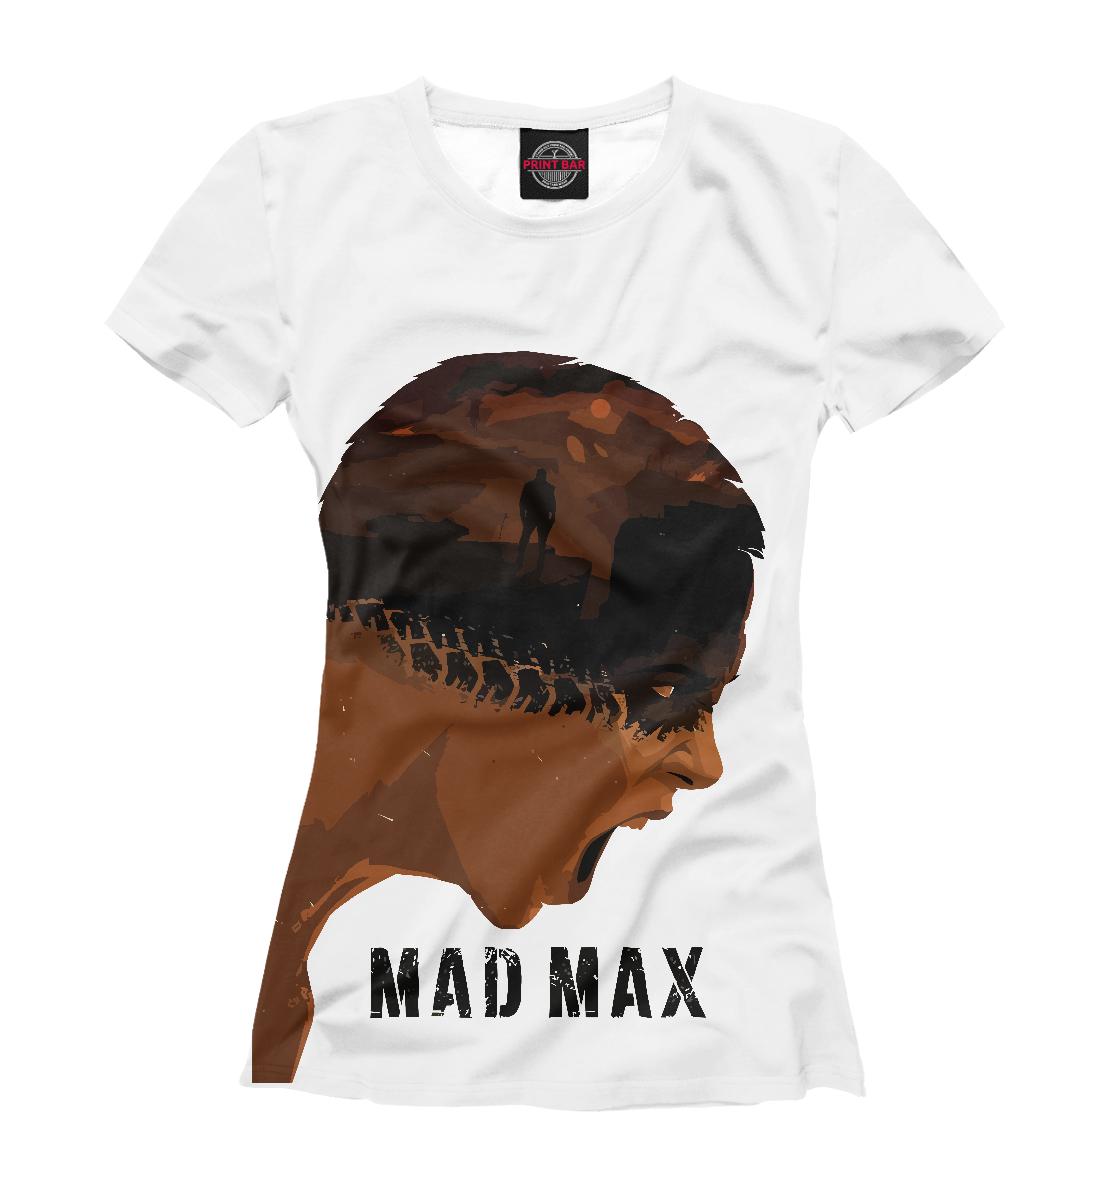 Mad Max, Printbar, Футболки, KNO-499365-fut-1  - купить со скидкой